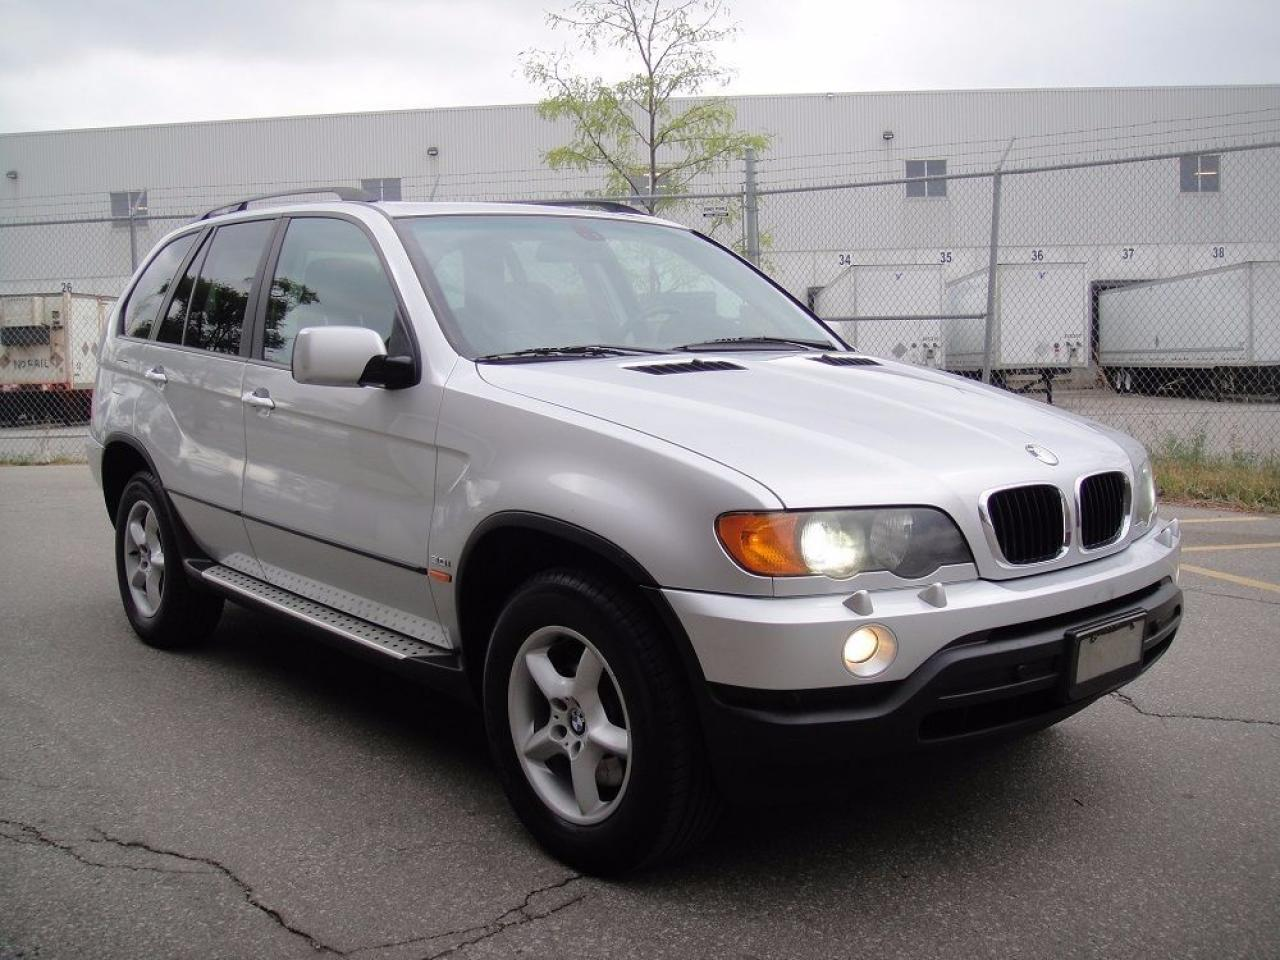 2003 BMW X5 3.0i SPOTLESS-FULLY LOADED,ZERO ACCIDENTS,MINT